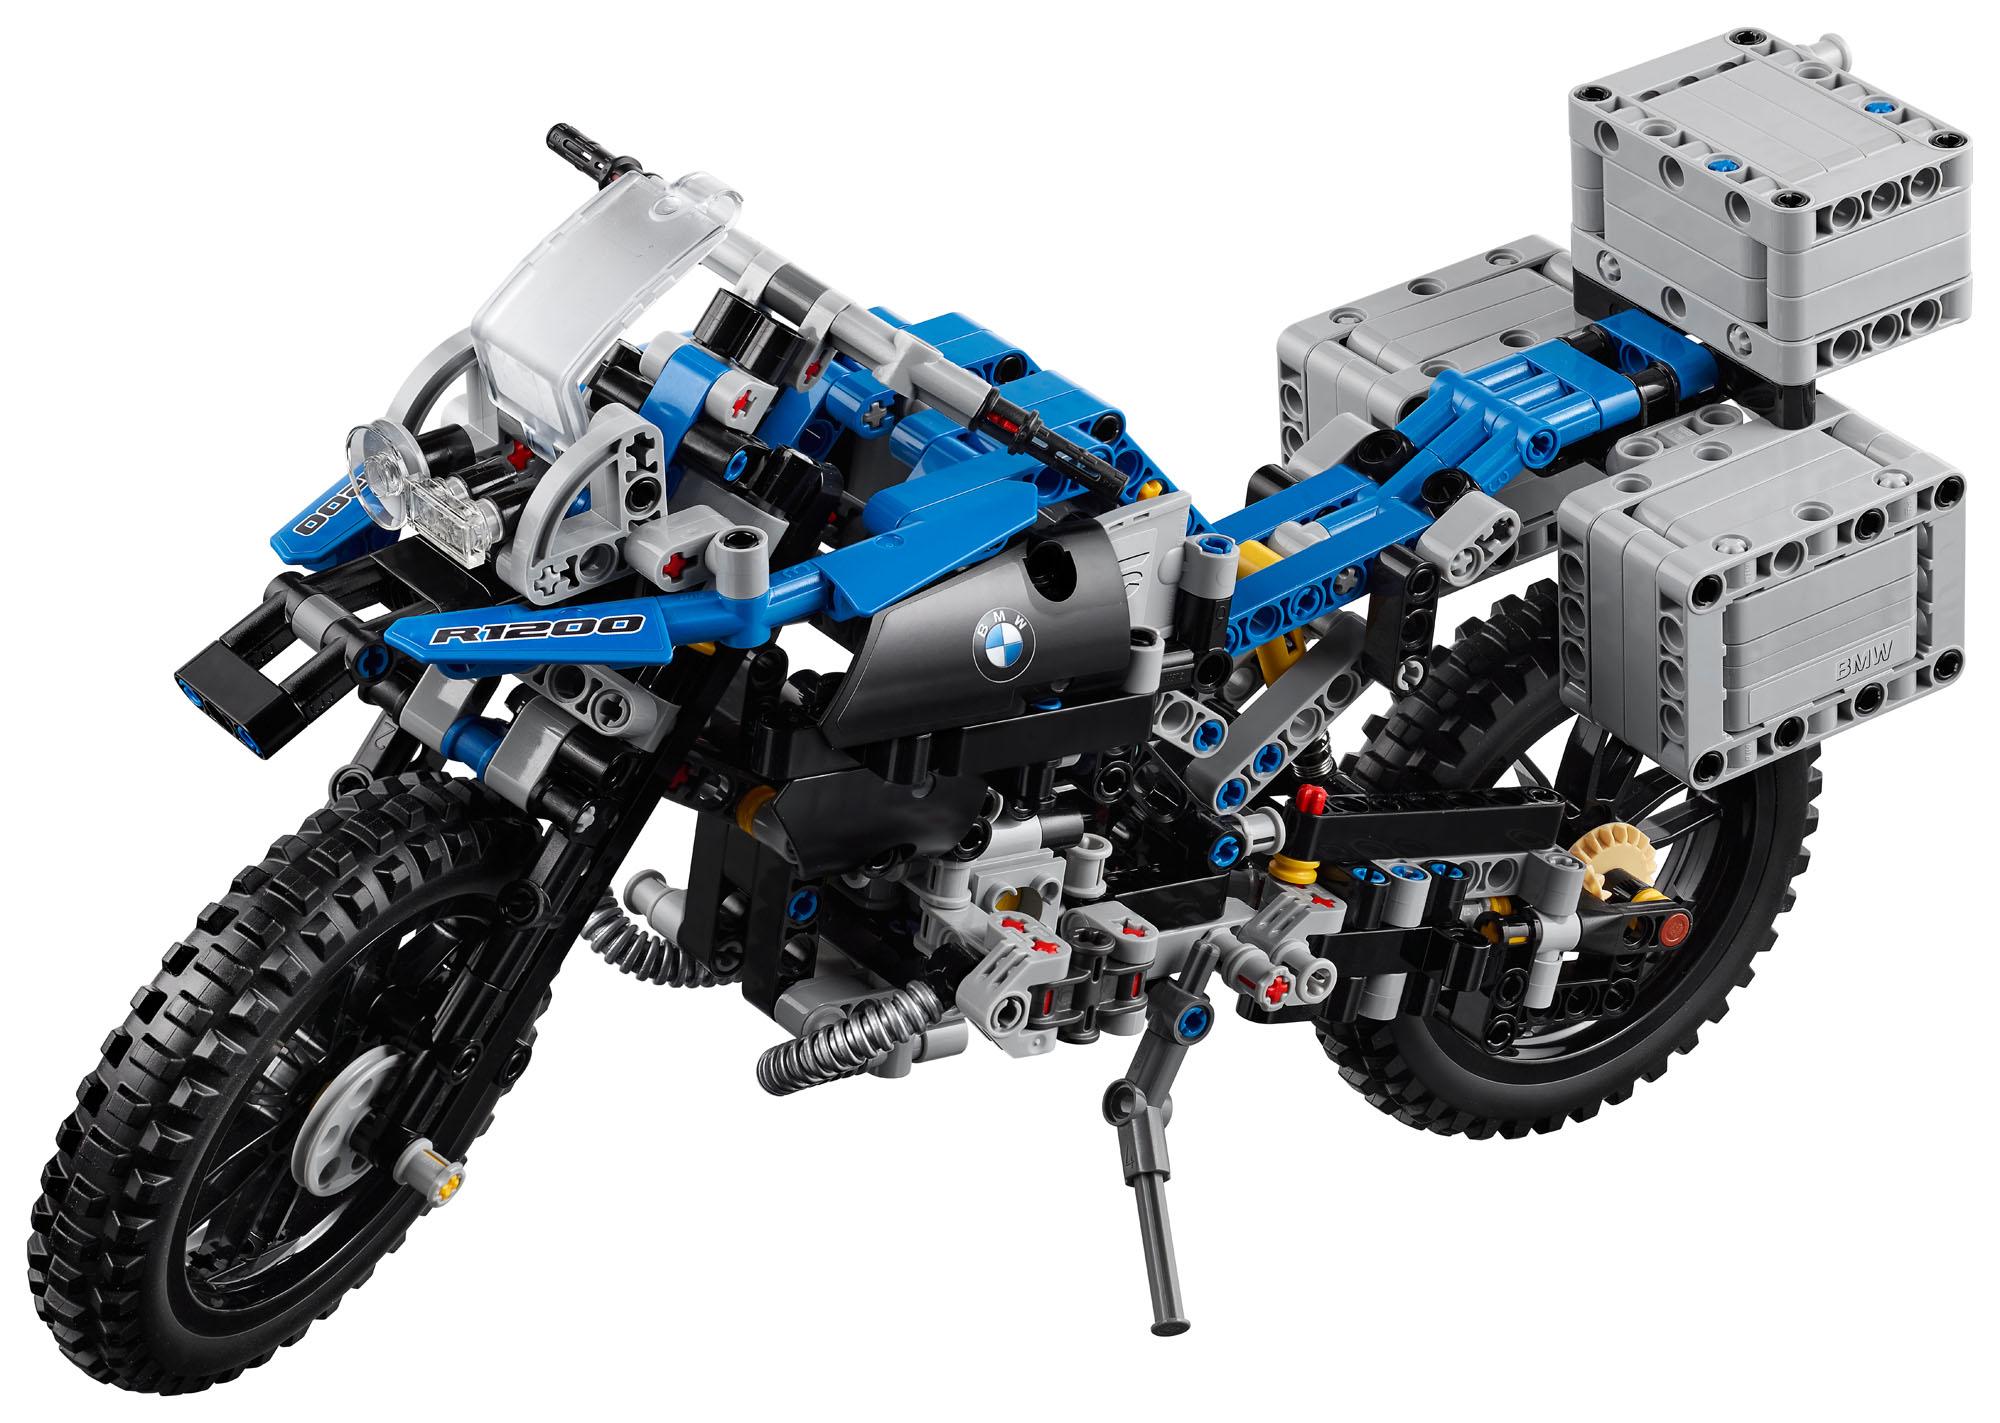 42063 lego technic bmw r 1200 gs adventure motorbike 603 pcs age 10 16